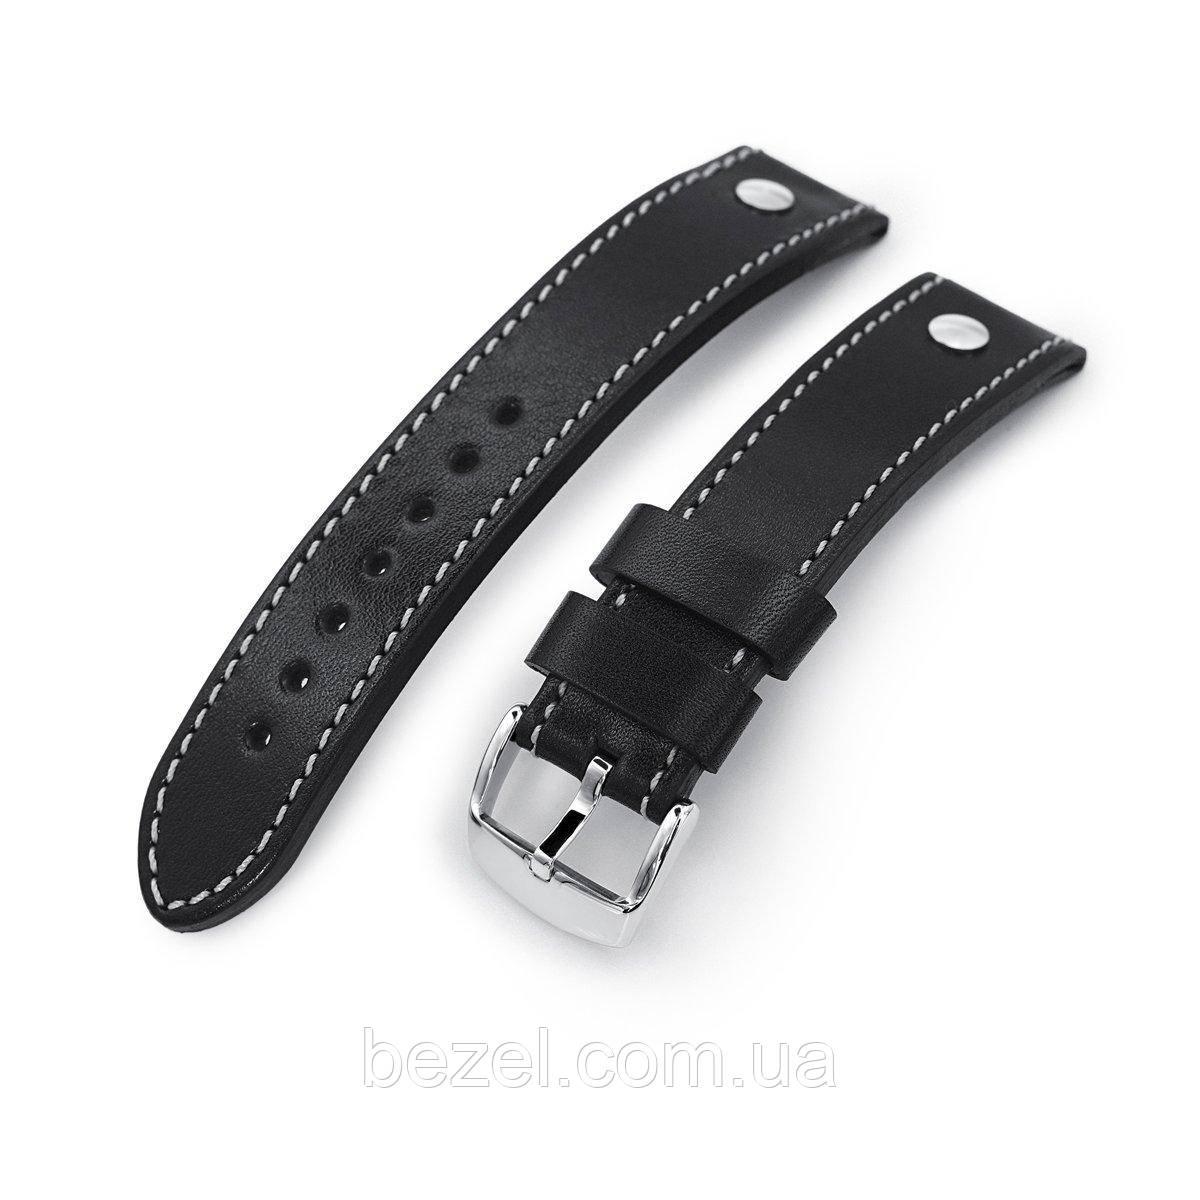 German made 22mm Sturdy Semi-gloss Black Saddle Leather with Rivet Watch Band, Polished